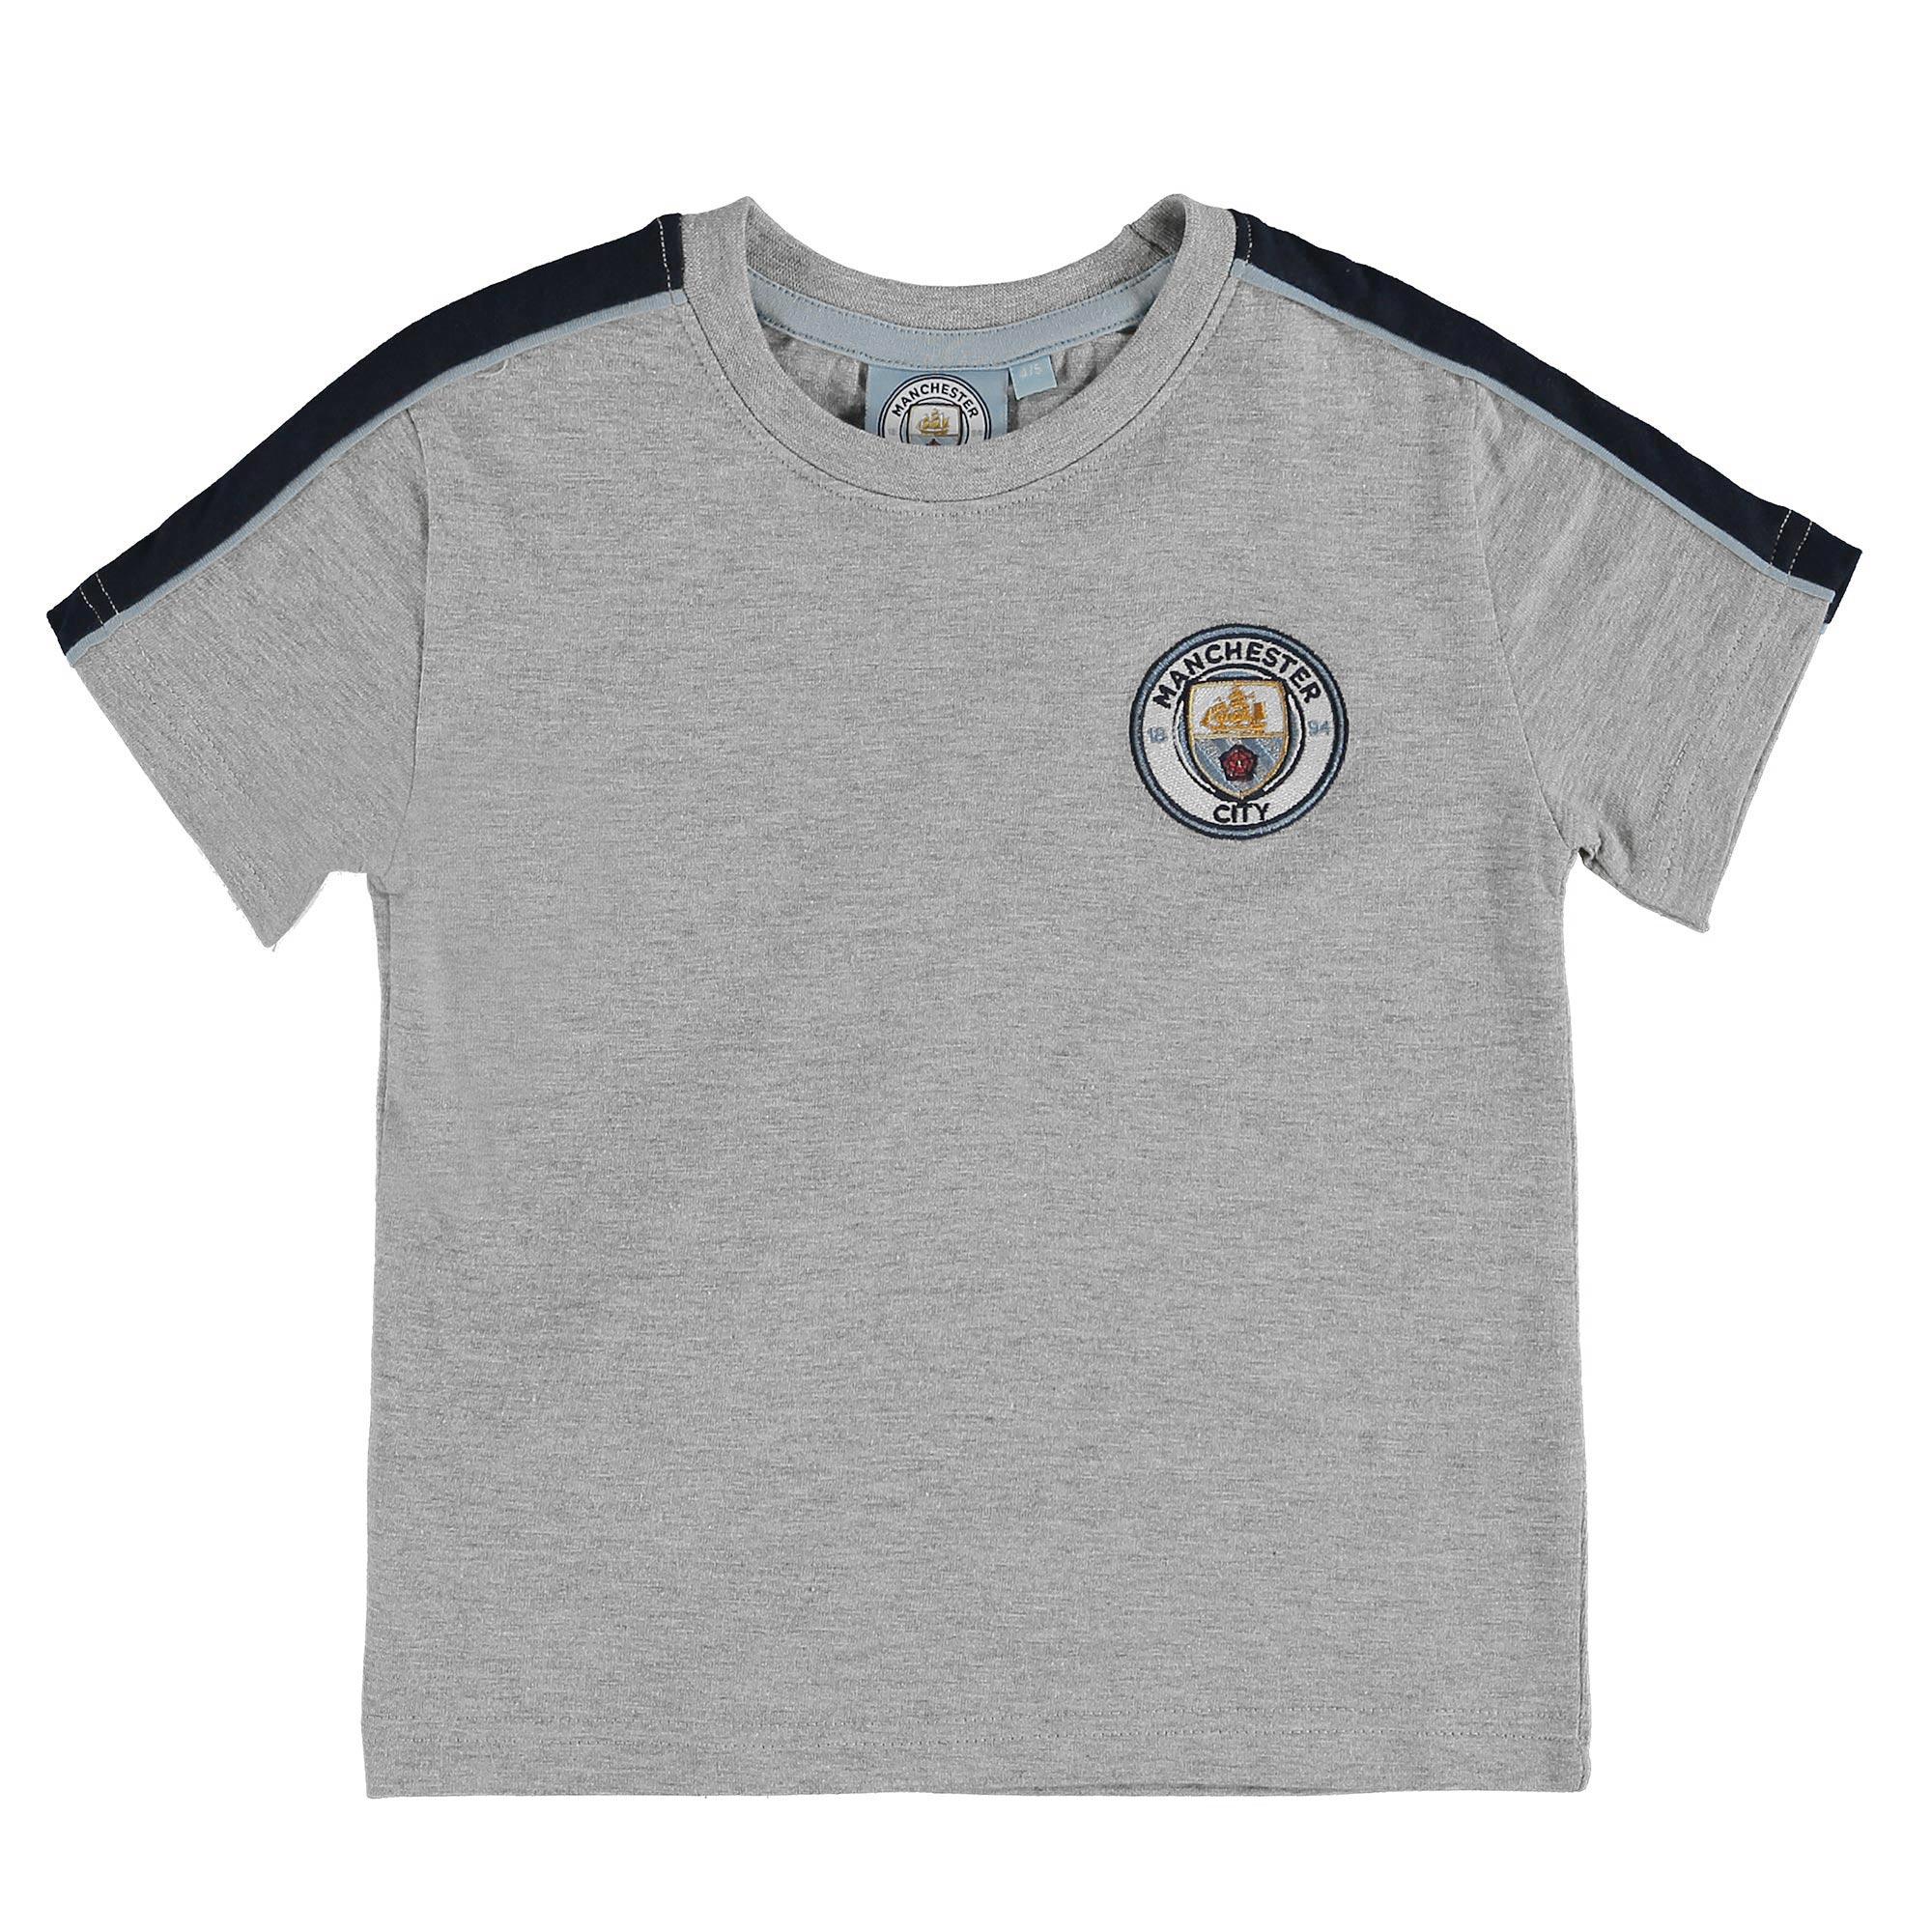 Manchester City T-Shirt - Grey Marl - Junior